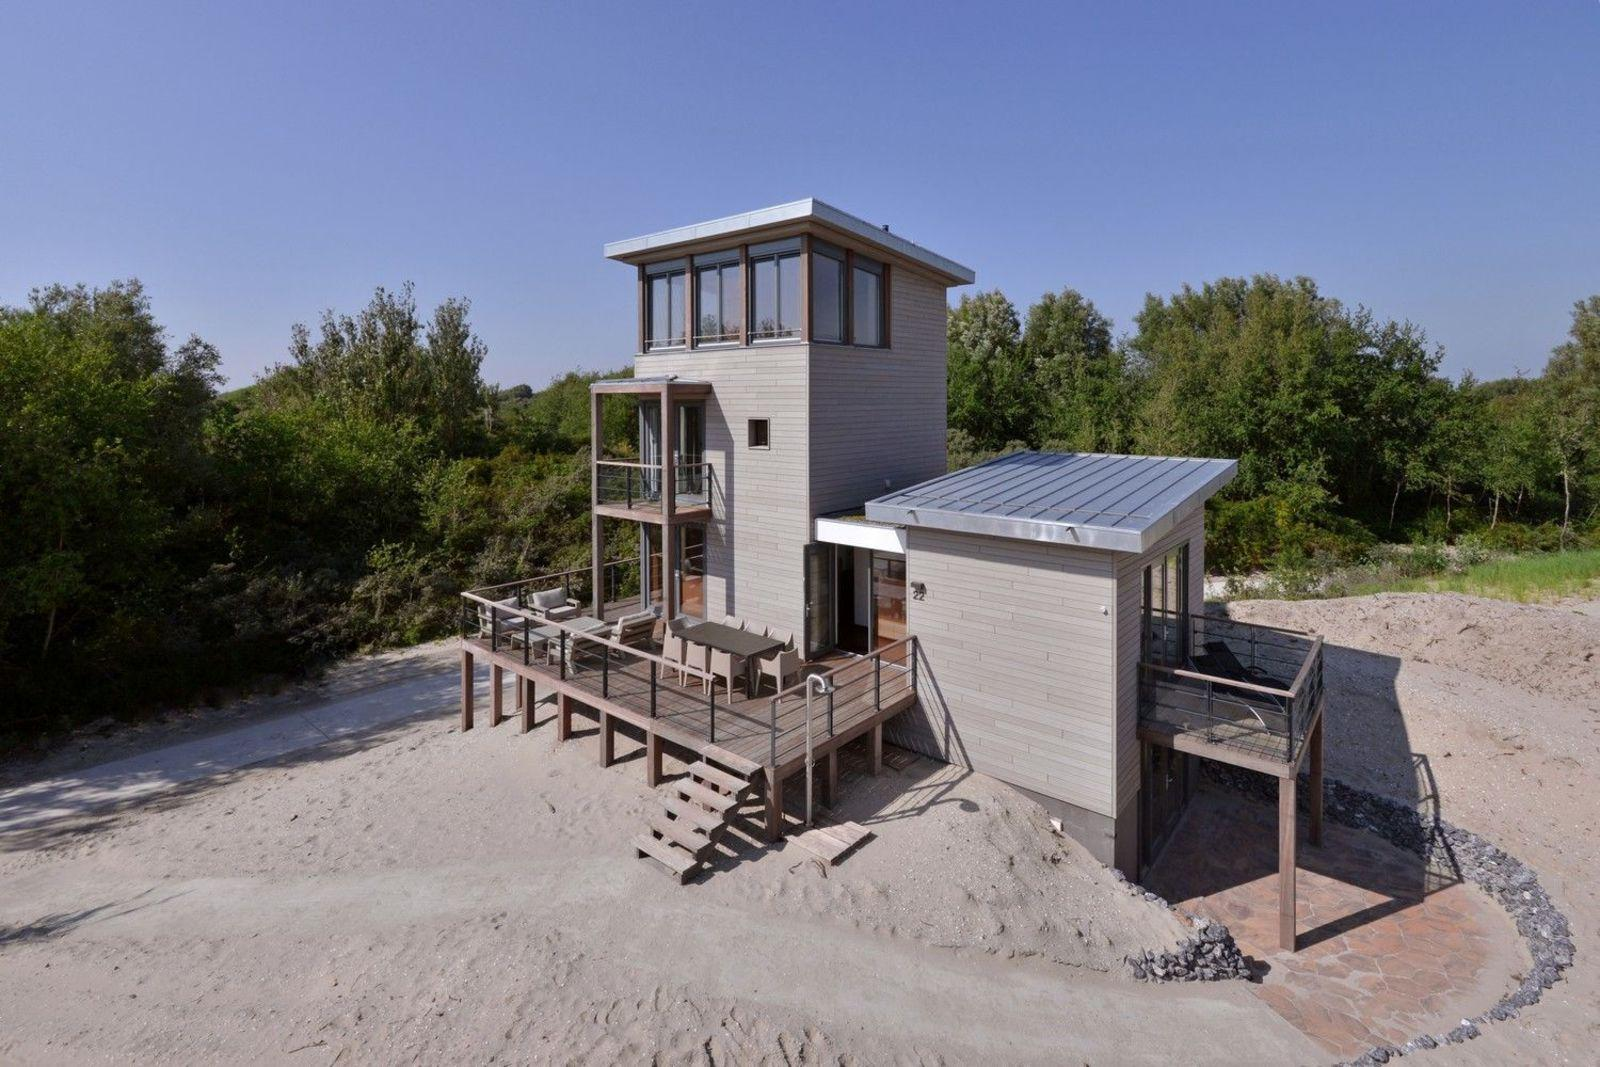 Oasis Parcs Vakantiehuis 8 personen Ouddorp Zuid-Holland